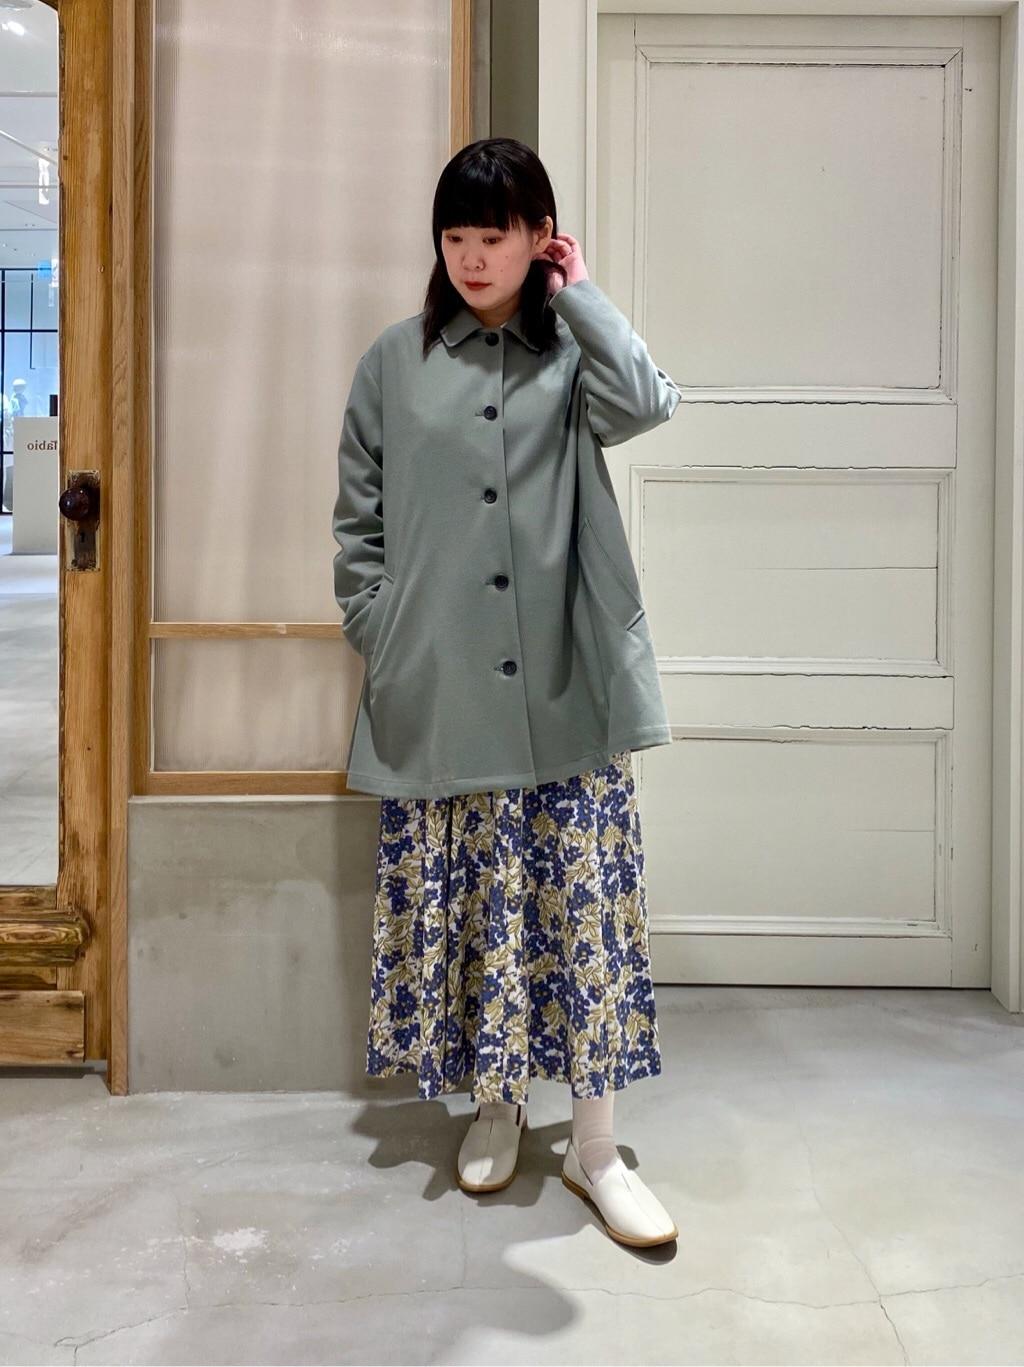 bulle de savon 渋谷スクランブルスクエア 身長:158cm 2020.12.16